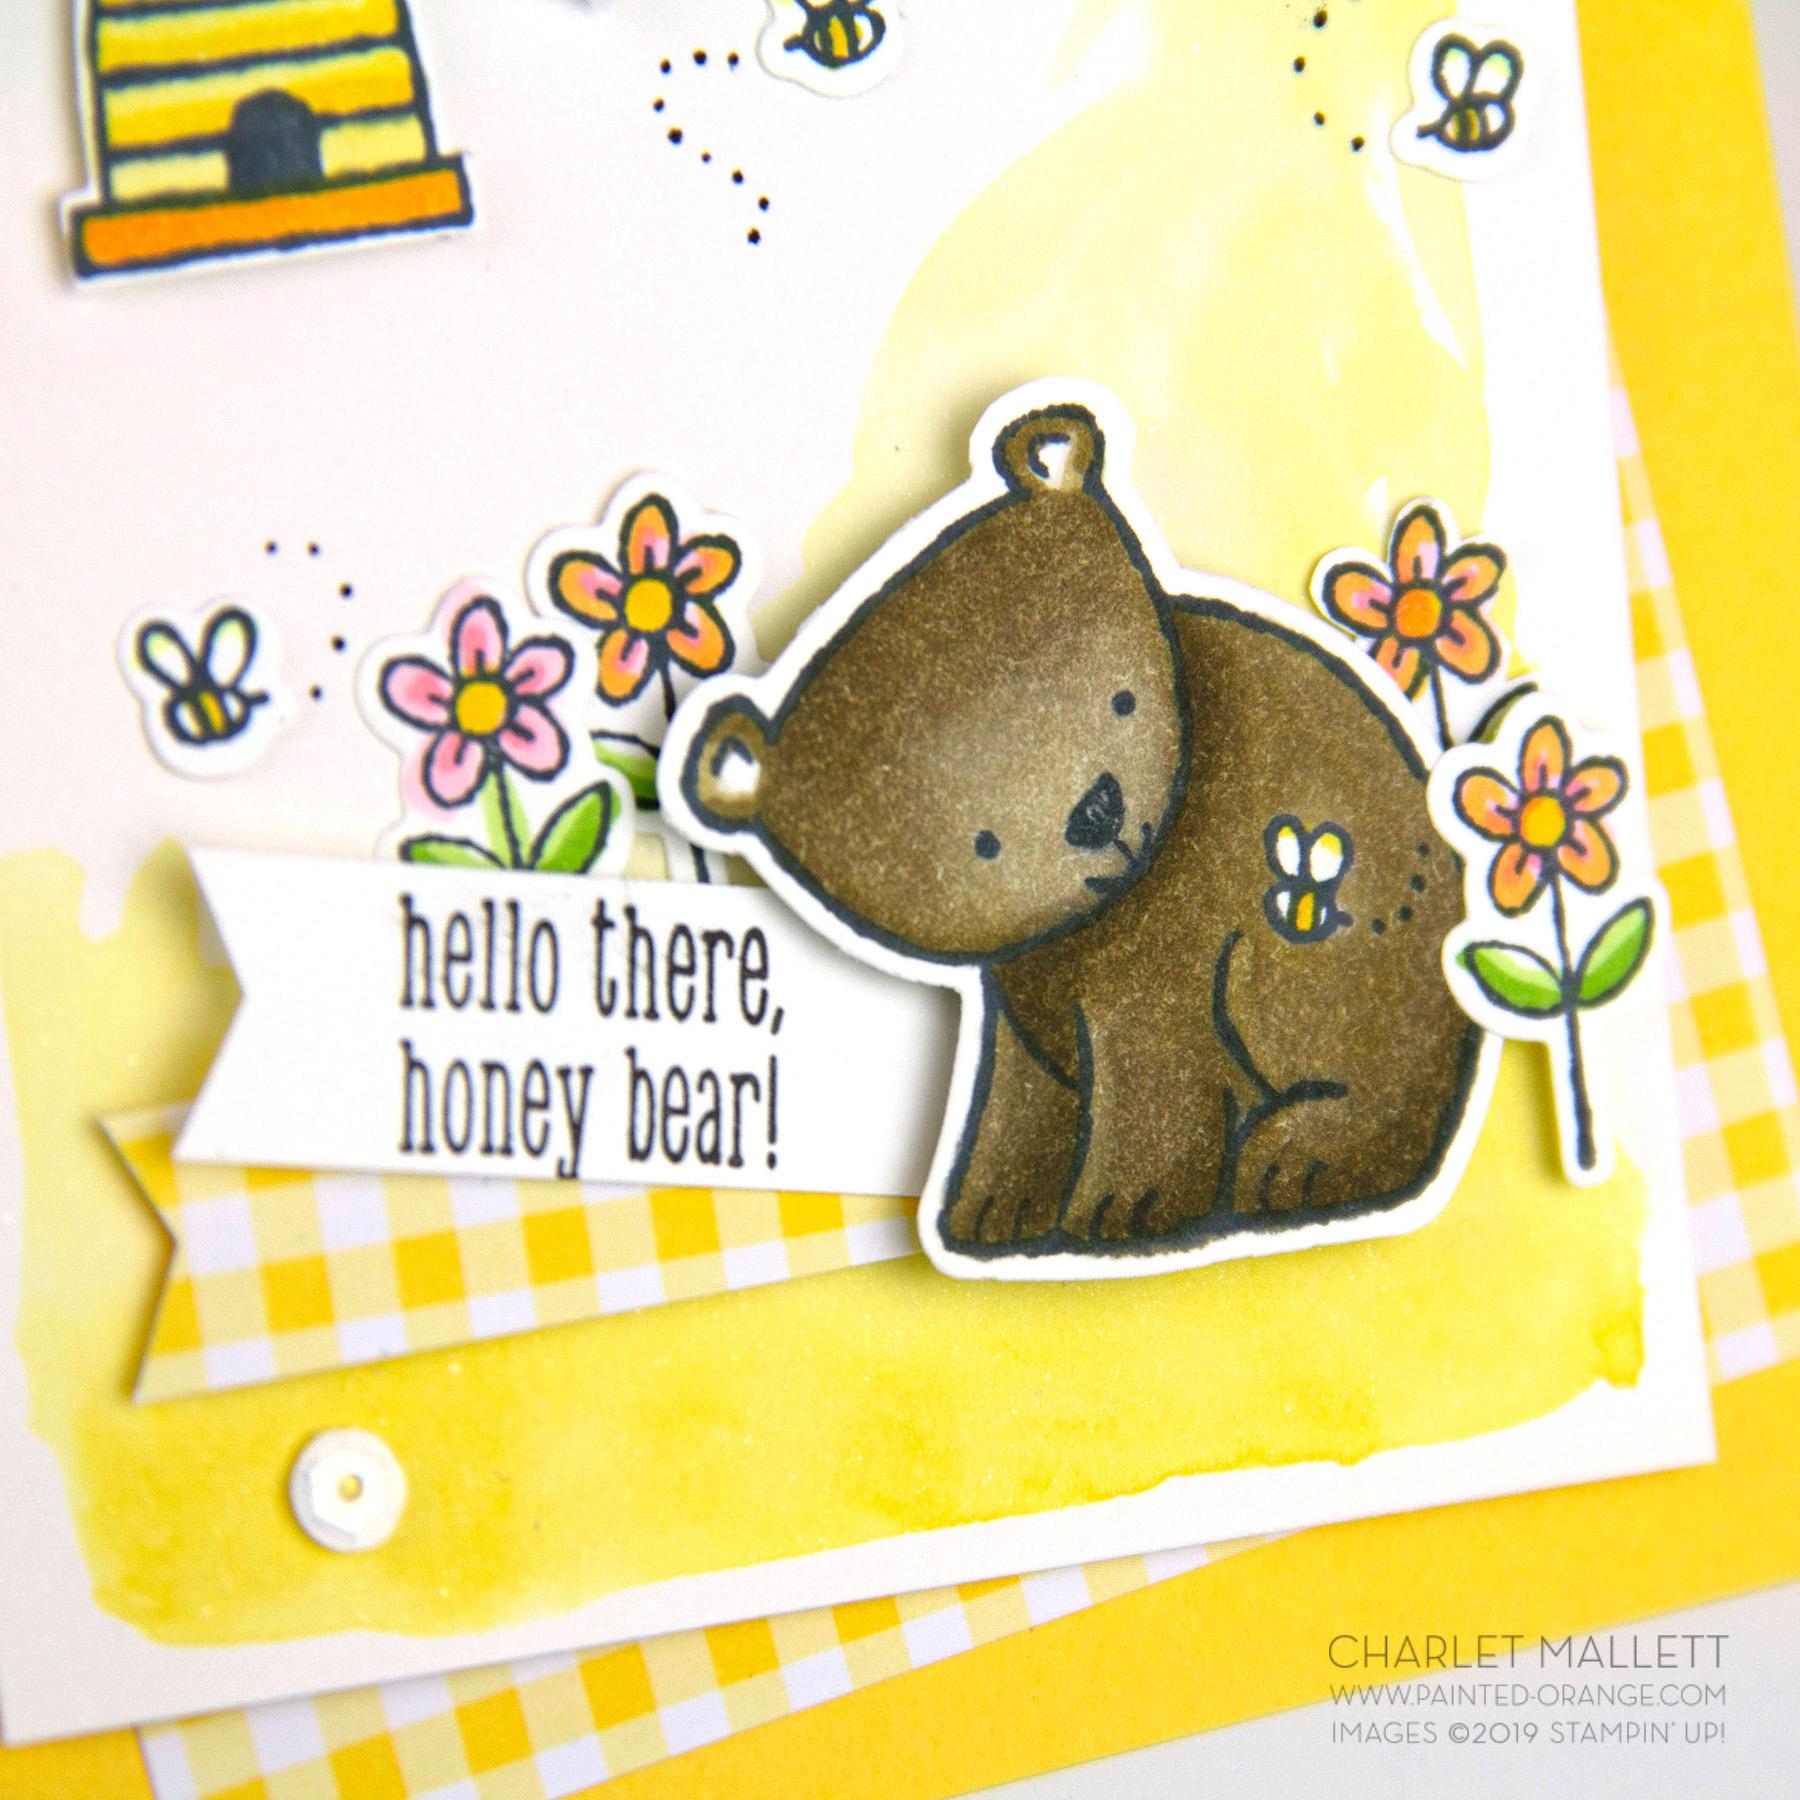 Honey Bear Card using A Little Wild stamp set - Charlet Mallett, Stampin' Up!